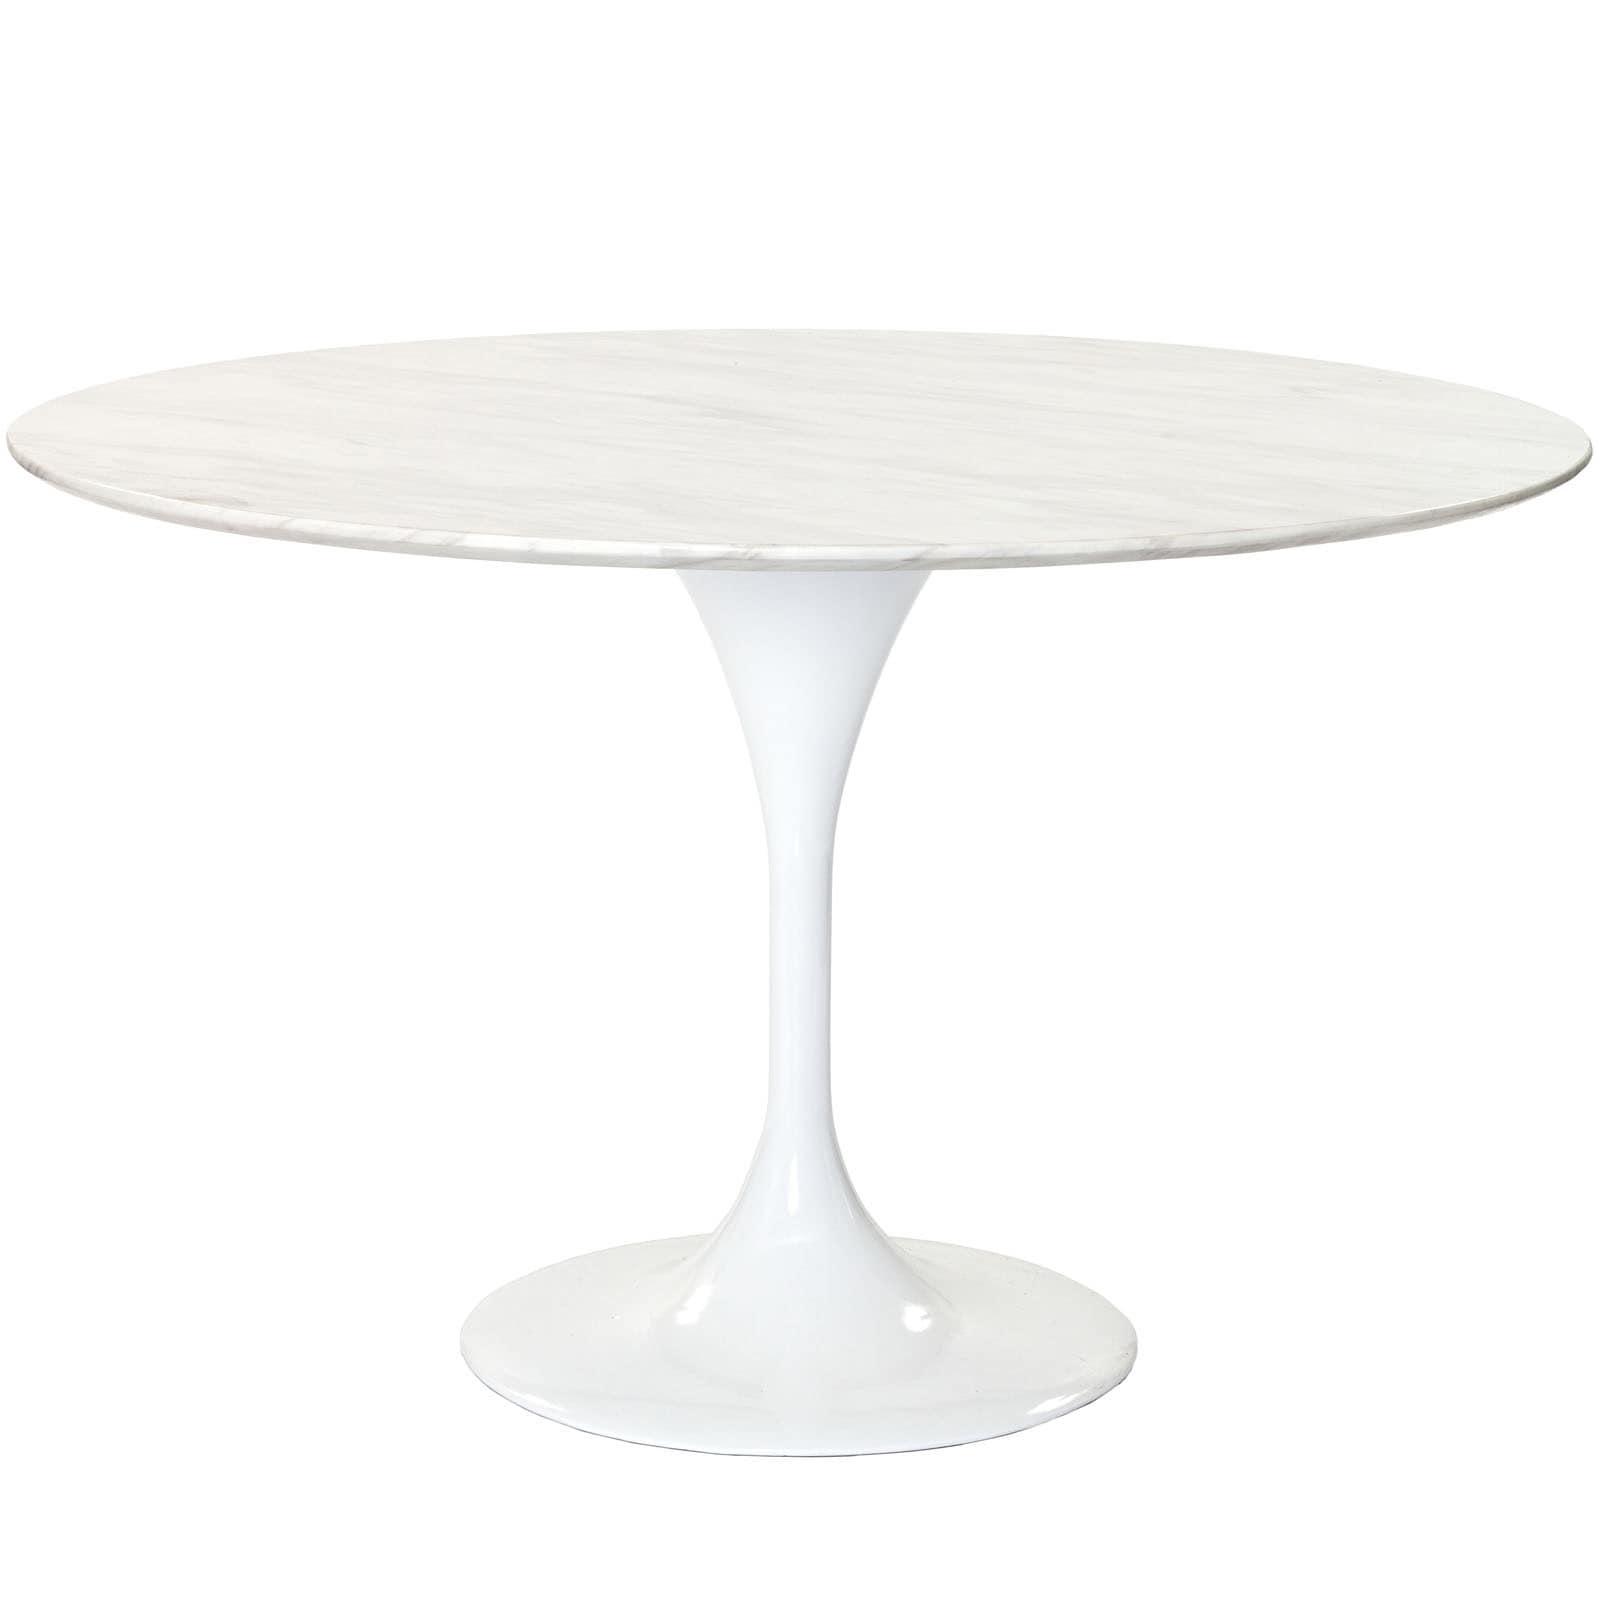 Eero Saarinen Reproduction 48 Inch White Marble Tulip Dining Table